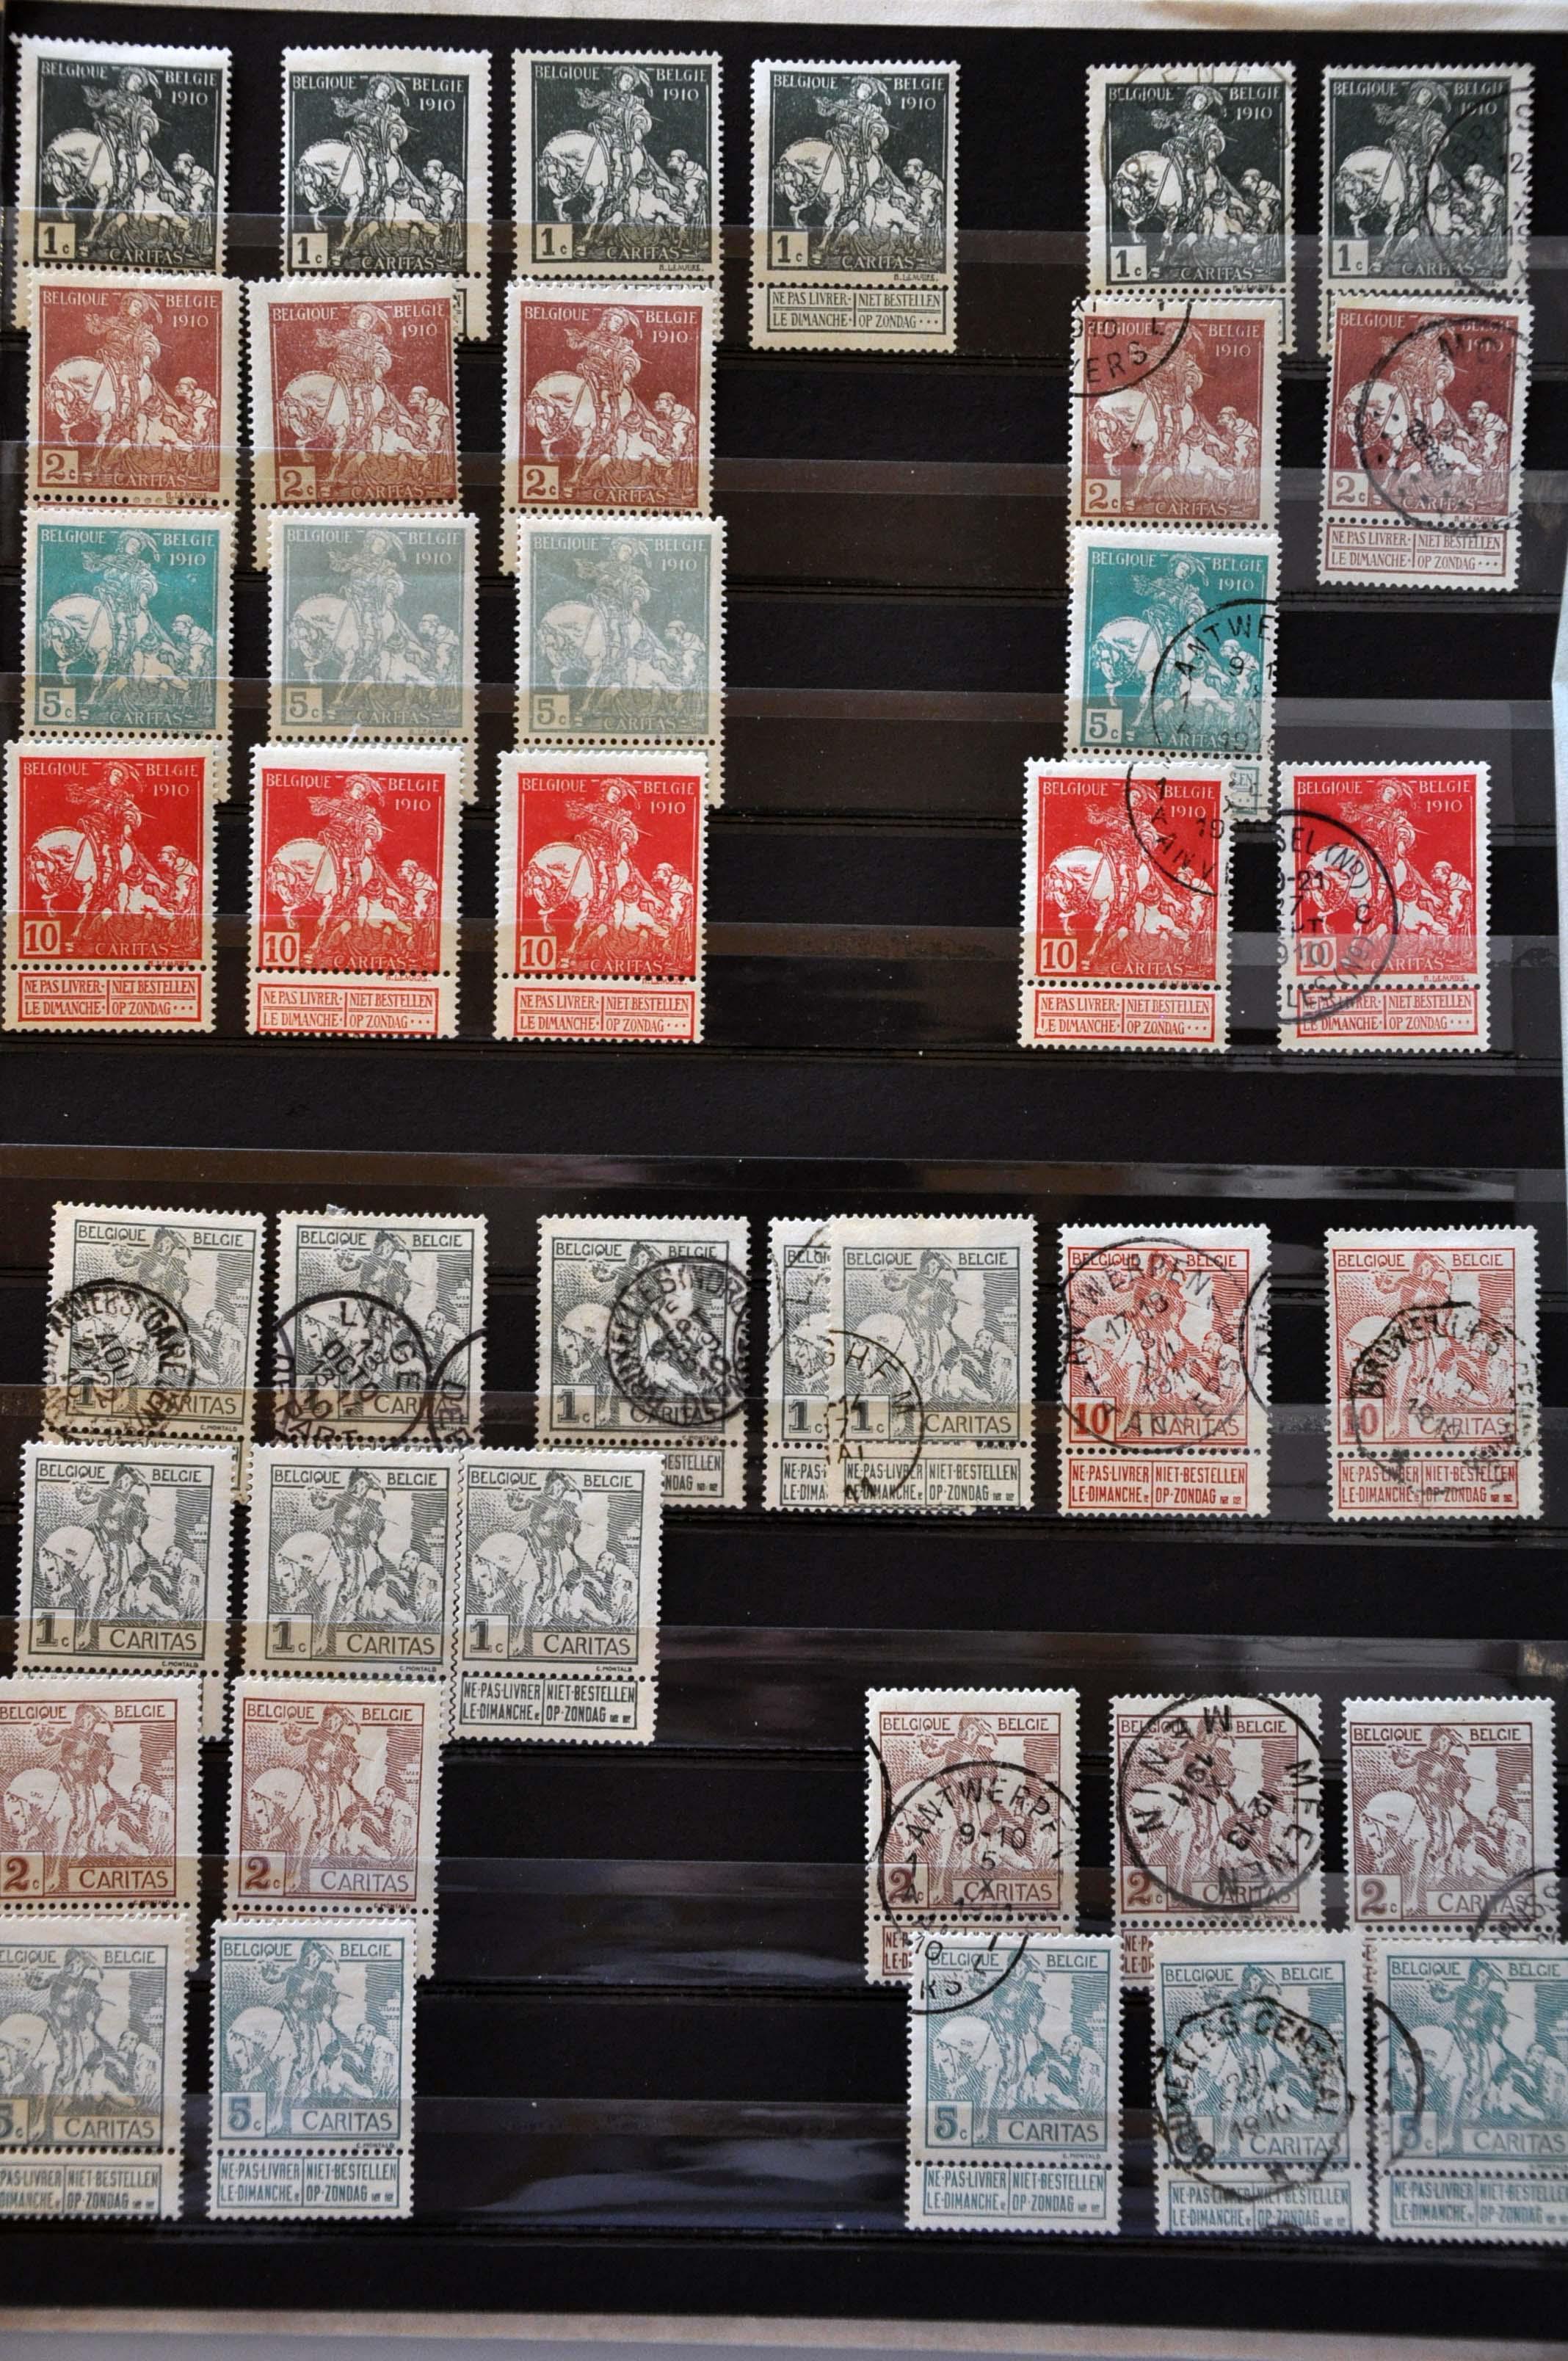 Lot 1432 - European Countries West European Countries -  Corinphila Veilingen Auction 245-246 Day 2 - Foreign countries - Collections and lots, Foreign countries - Boxes and literature